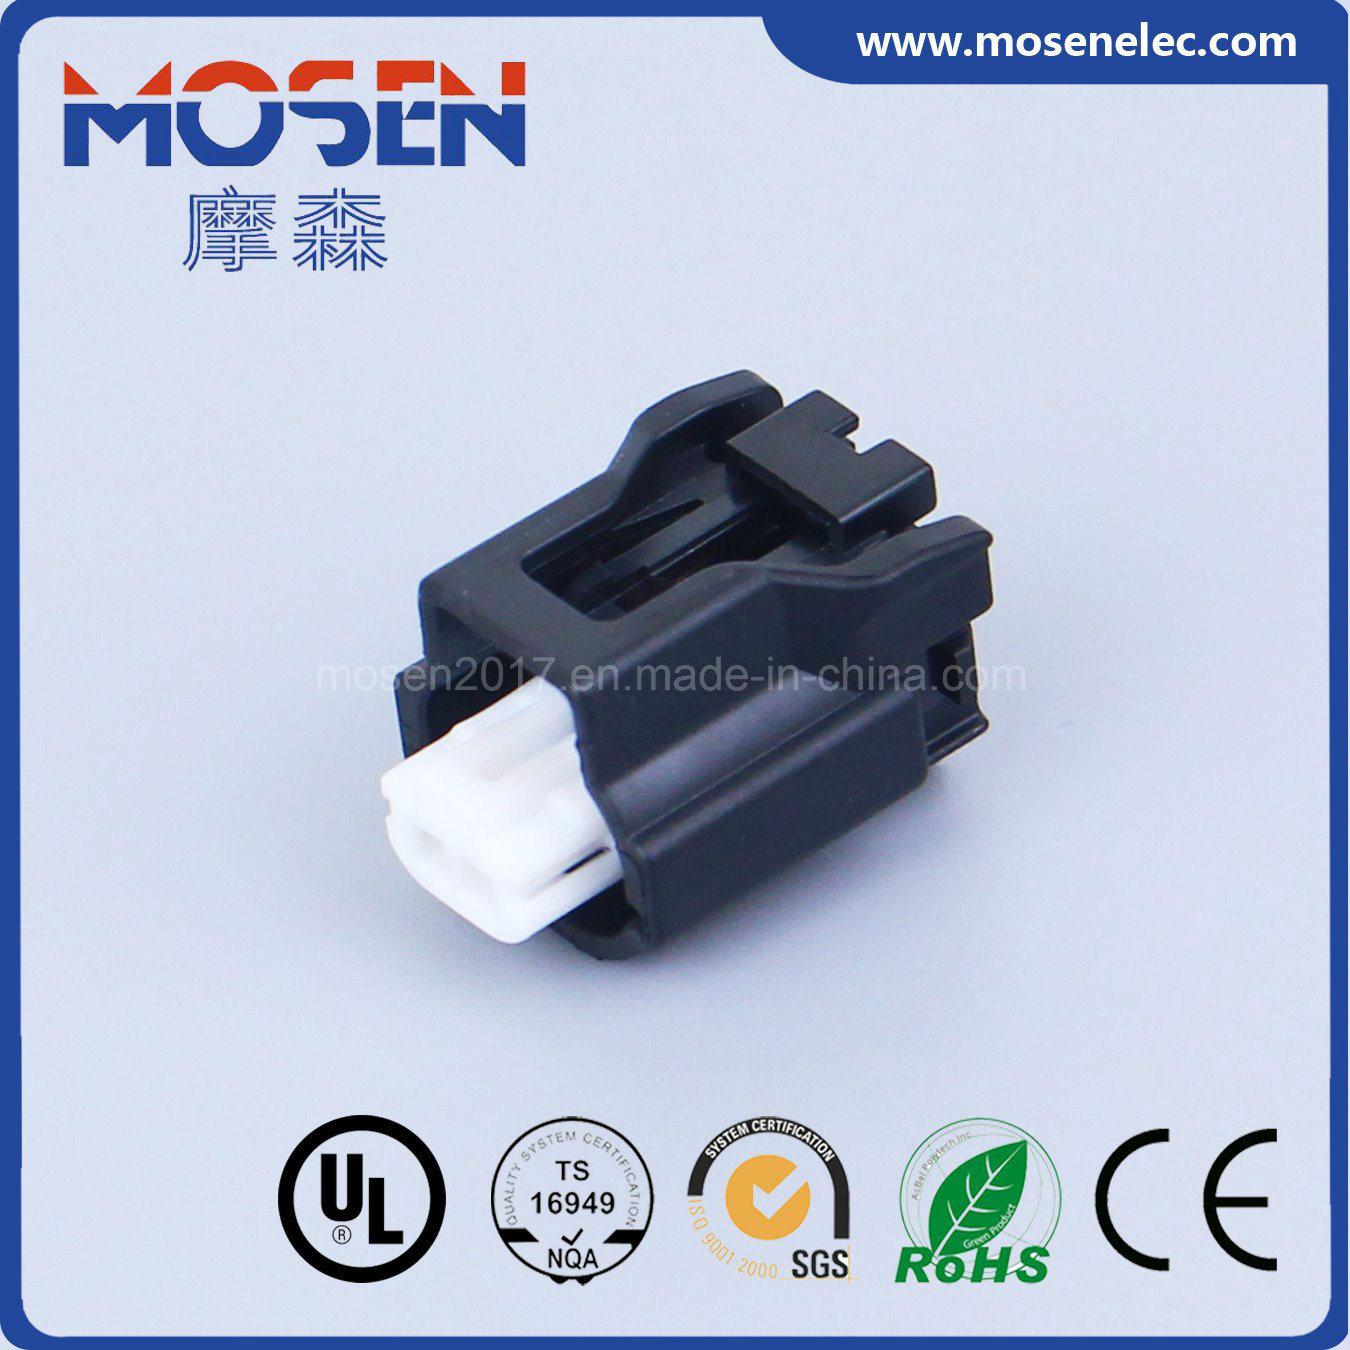 Sumitomo 6189-7523 6918-3271 2p Female Automotive Connector Cable Harness